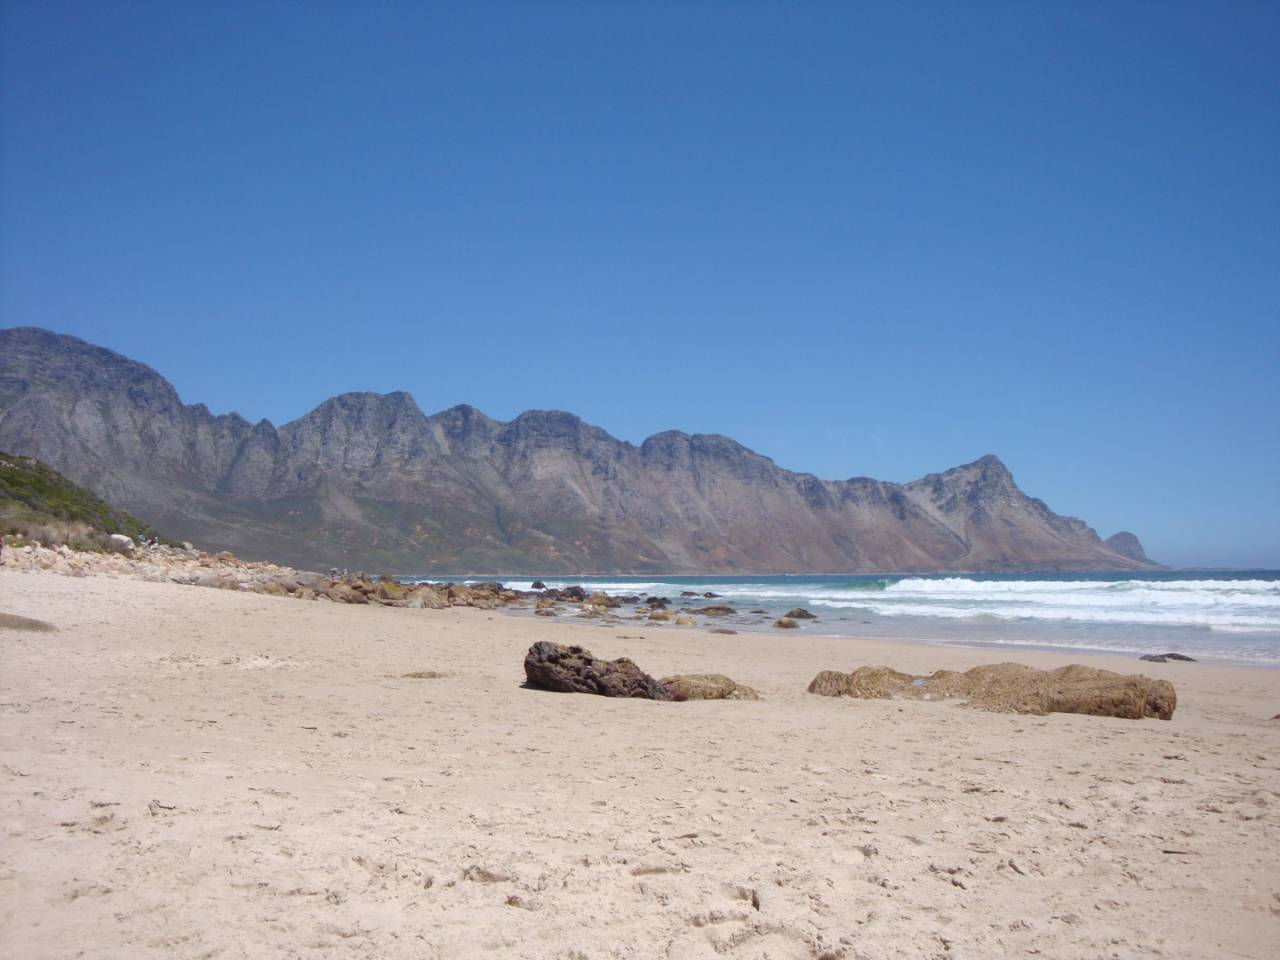 Kogel bay beach